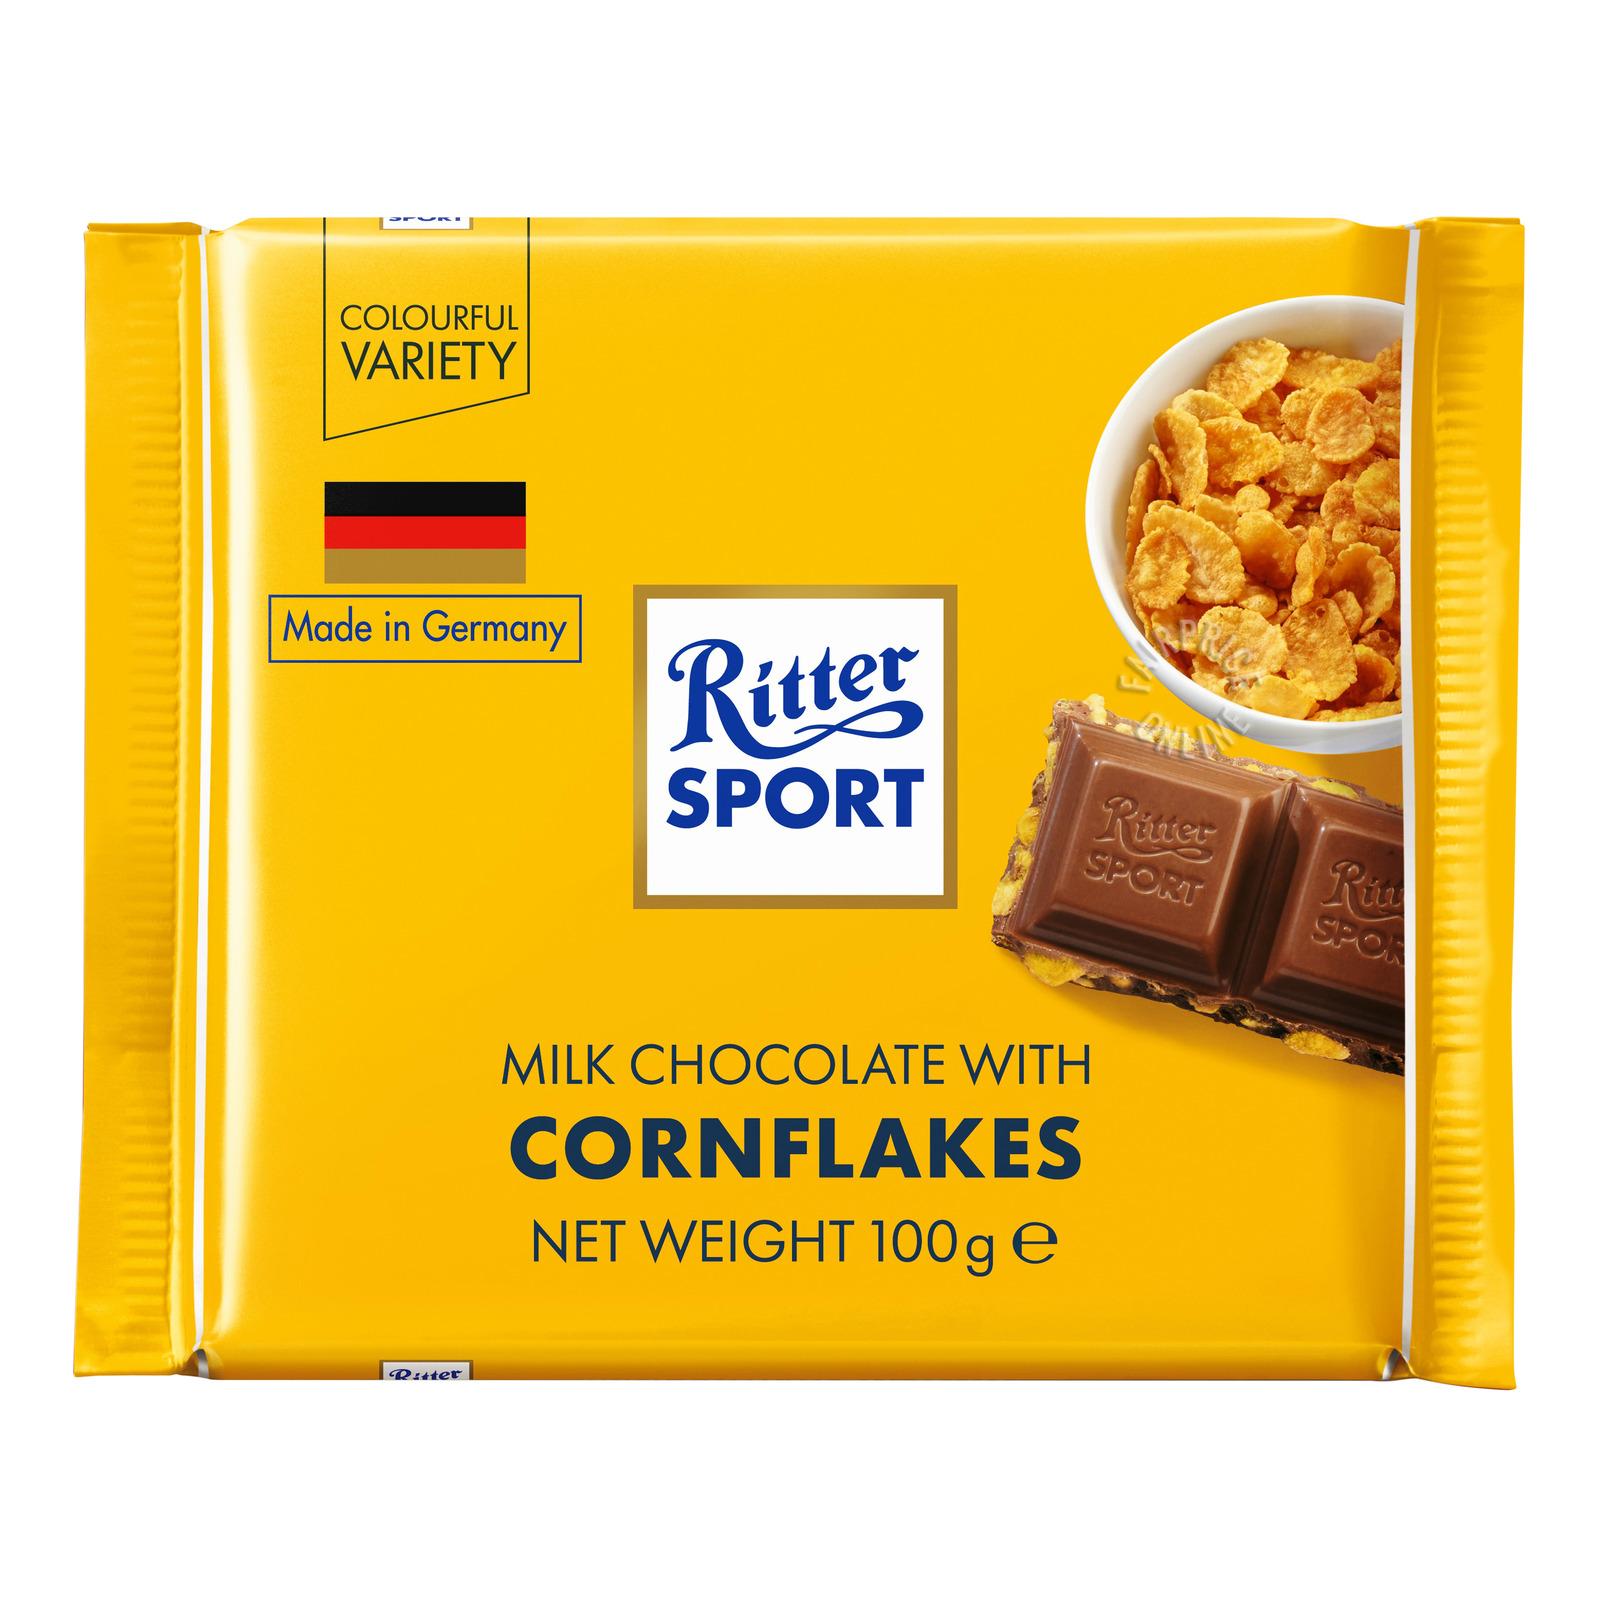 RITTER SPORT Milk Chocolate W/ Cornflakes 100g